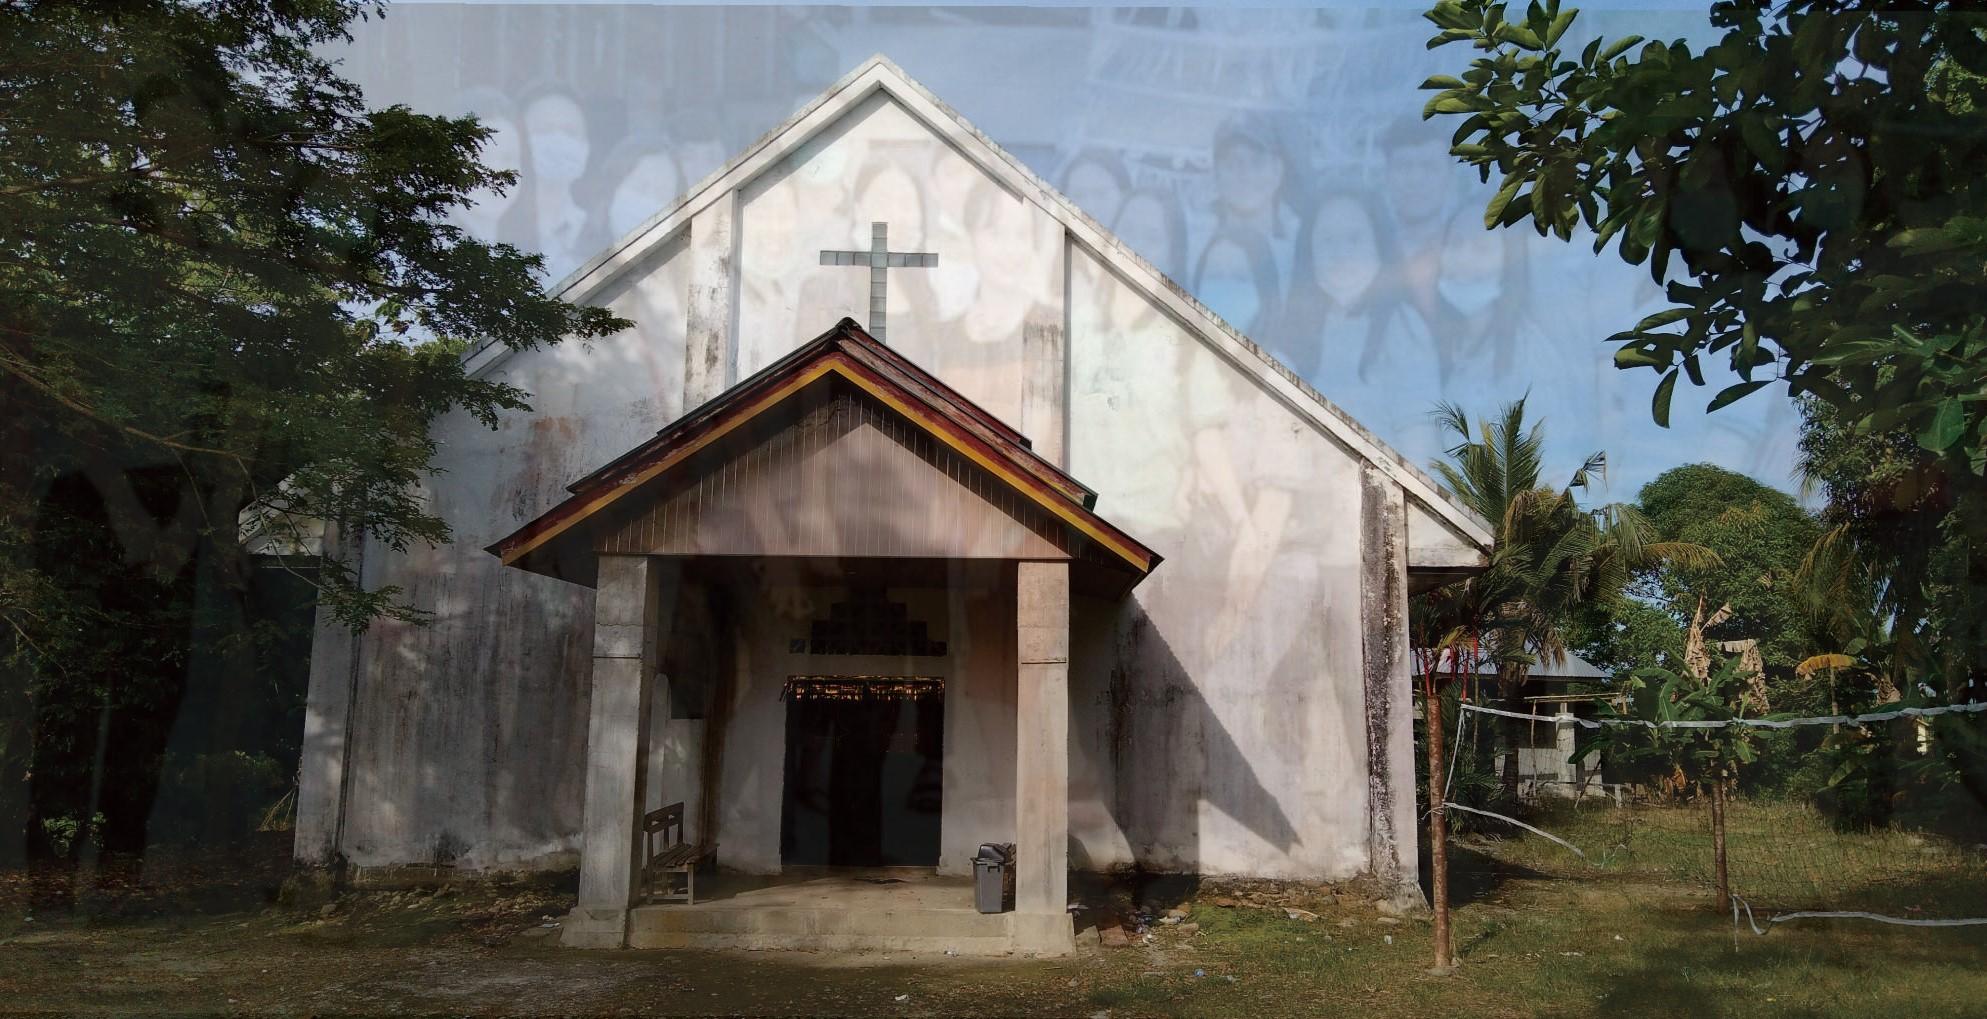 Gedung Gereja Jemaat Silo Rante Lara